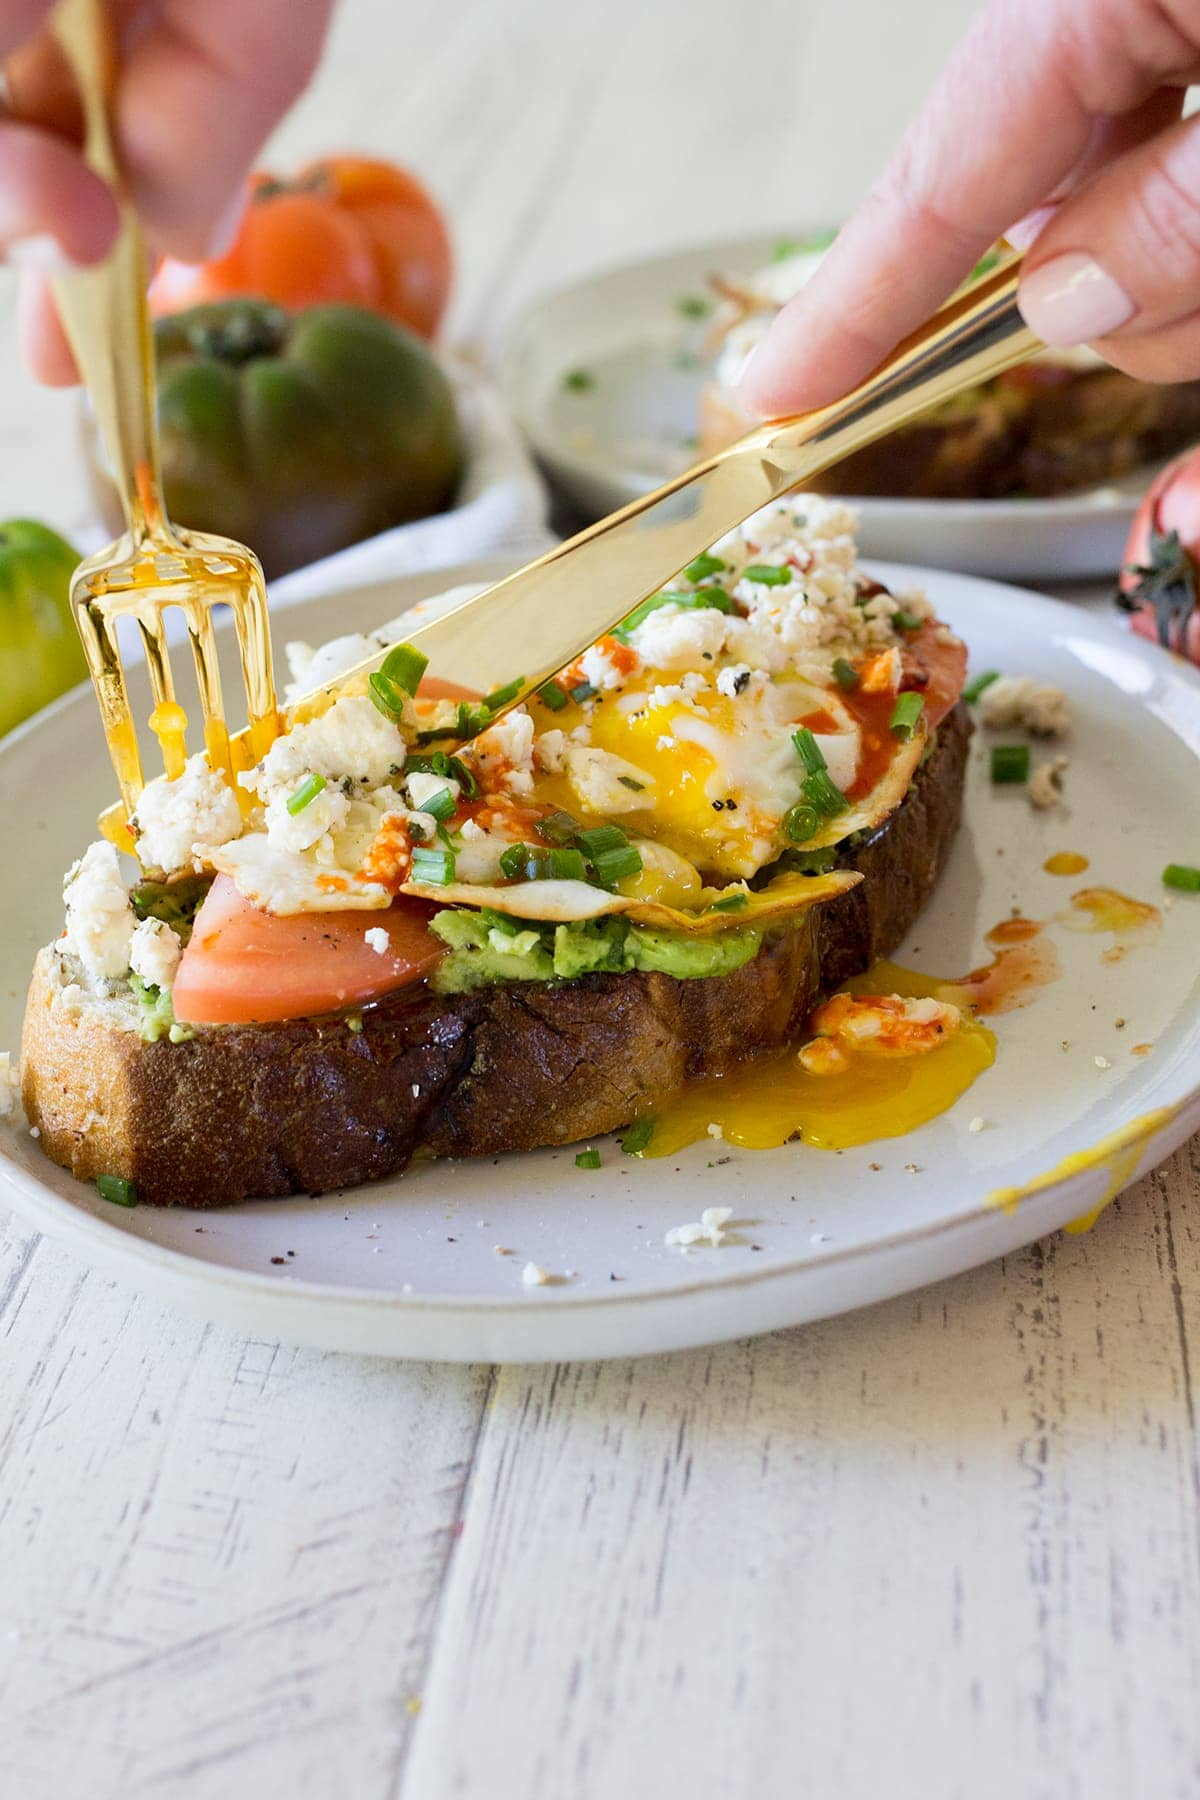 Fried Egg Avocado Toast With Tomato And Feta Cheese